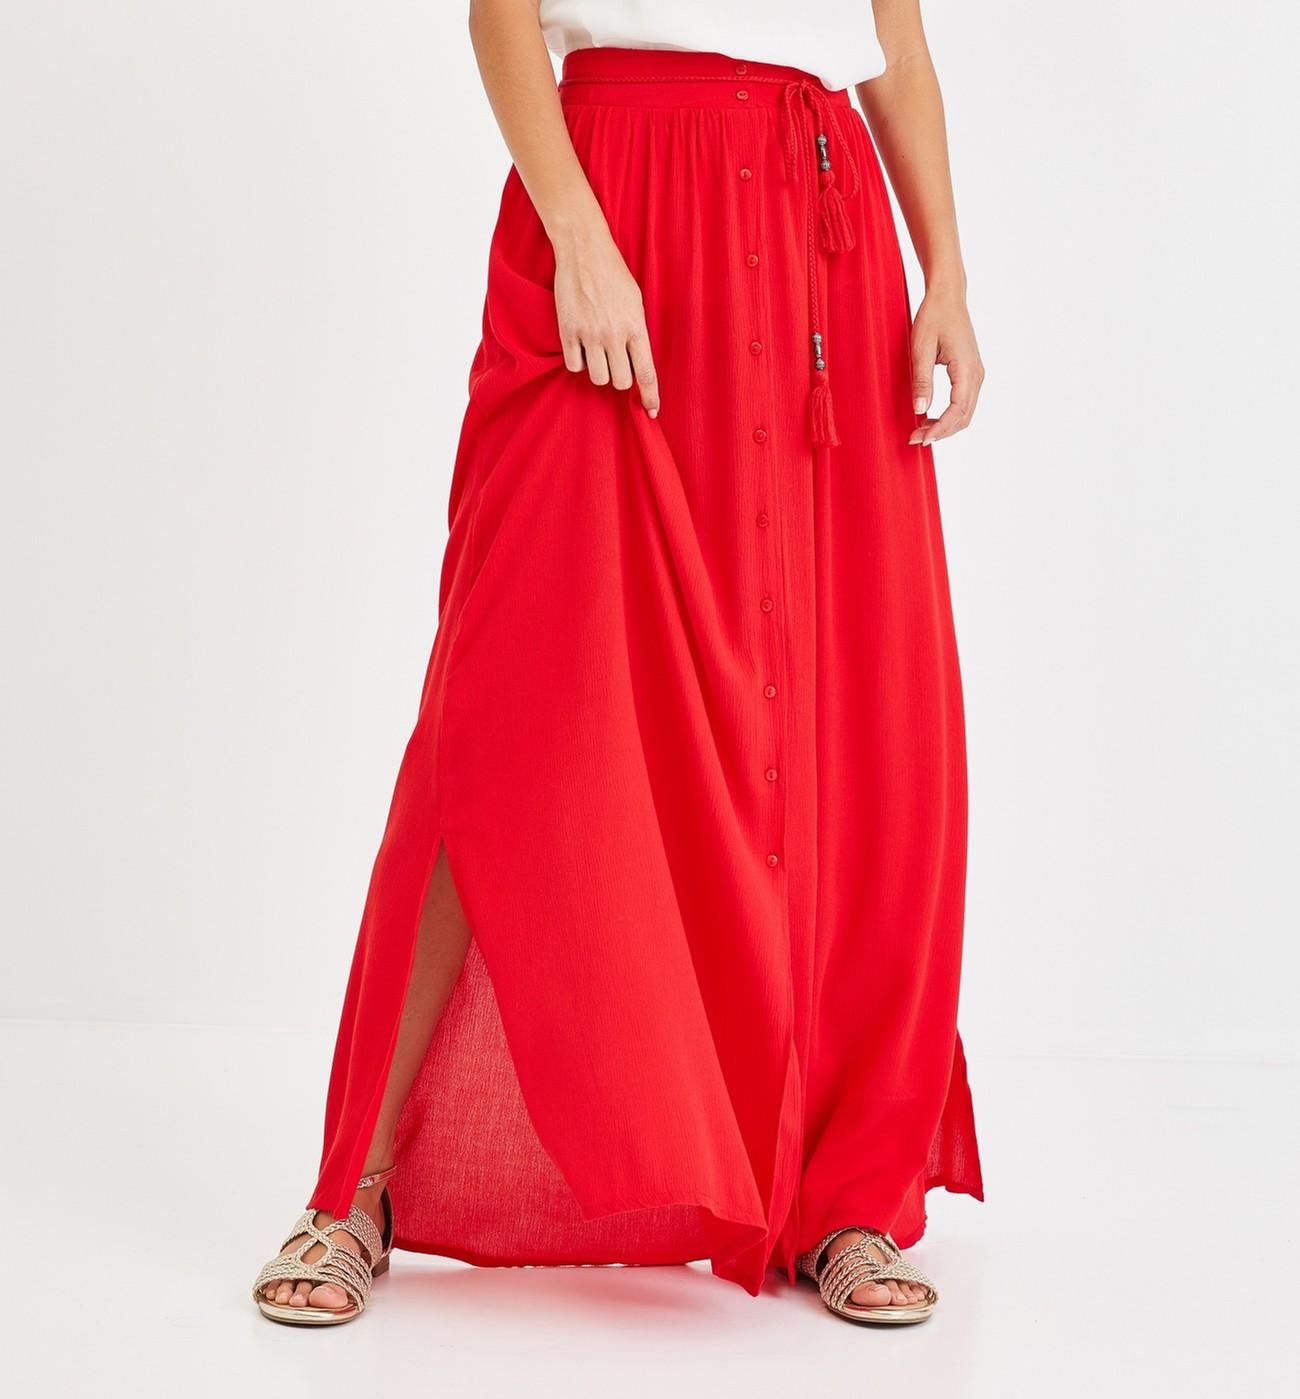 Longue Jupe Jupe Promod Longue Crêpon Crêpon Promod Femme UVMpSz